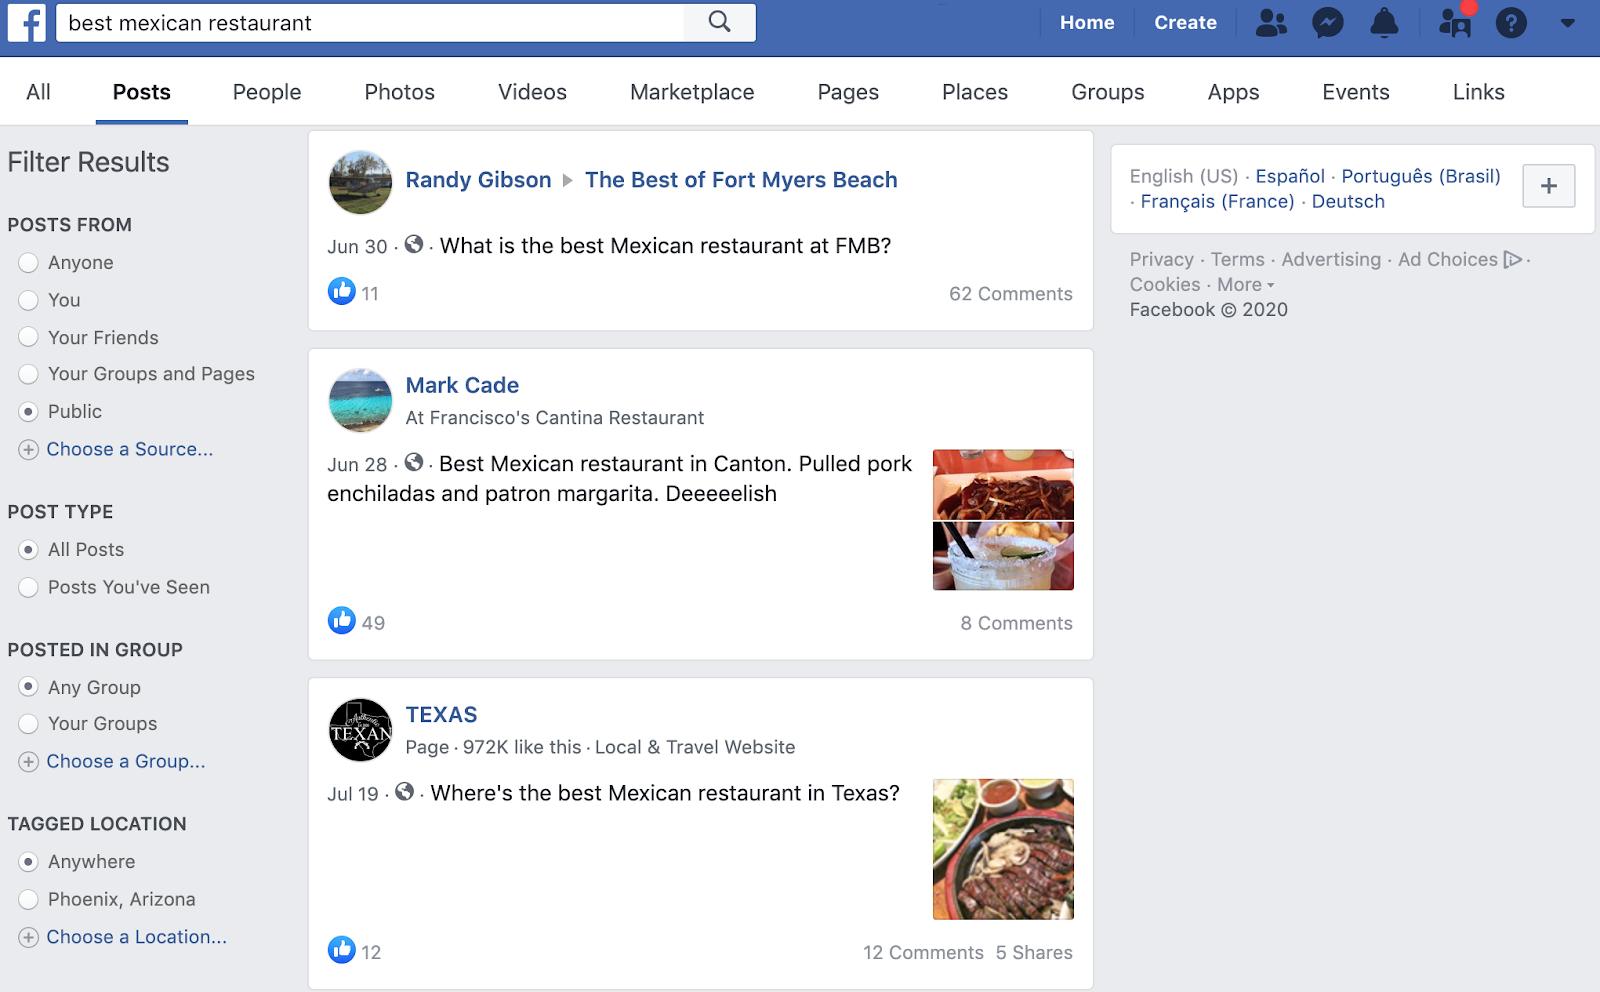 Best Mexican Restaurants on Facebook